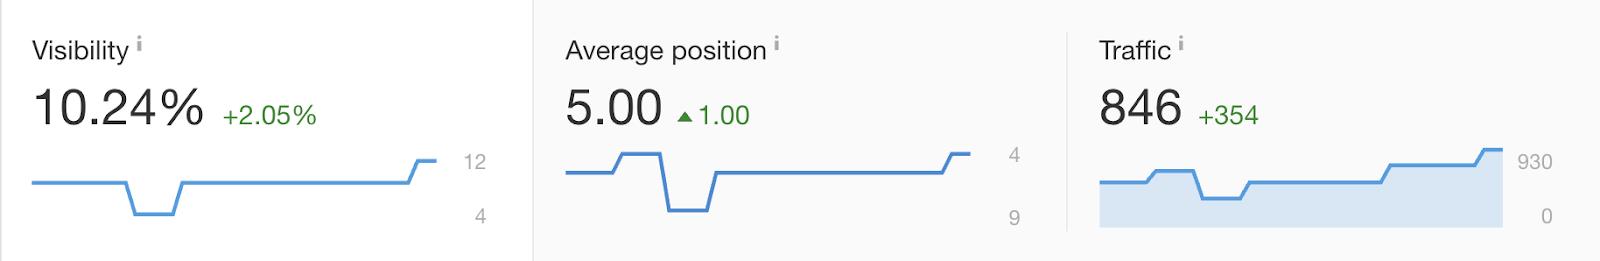 average position traffic